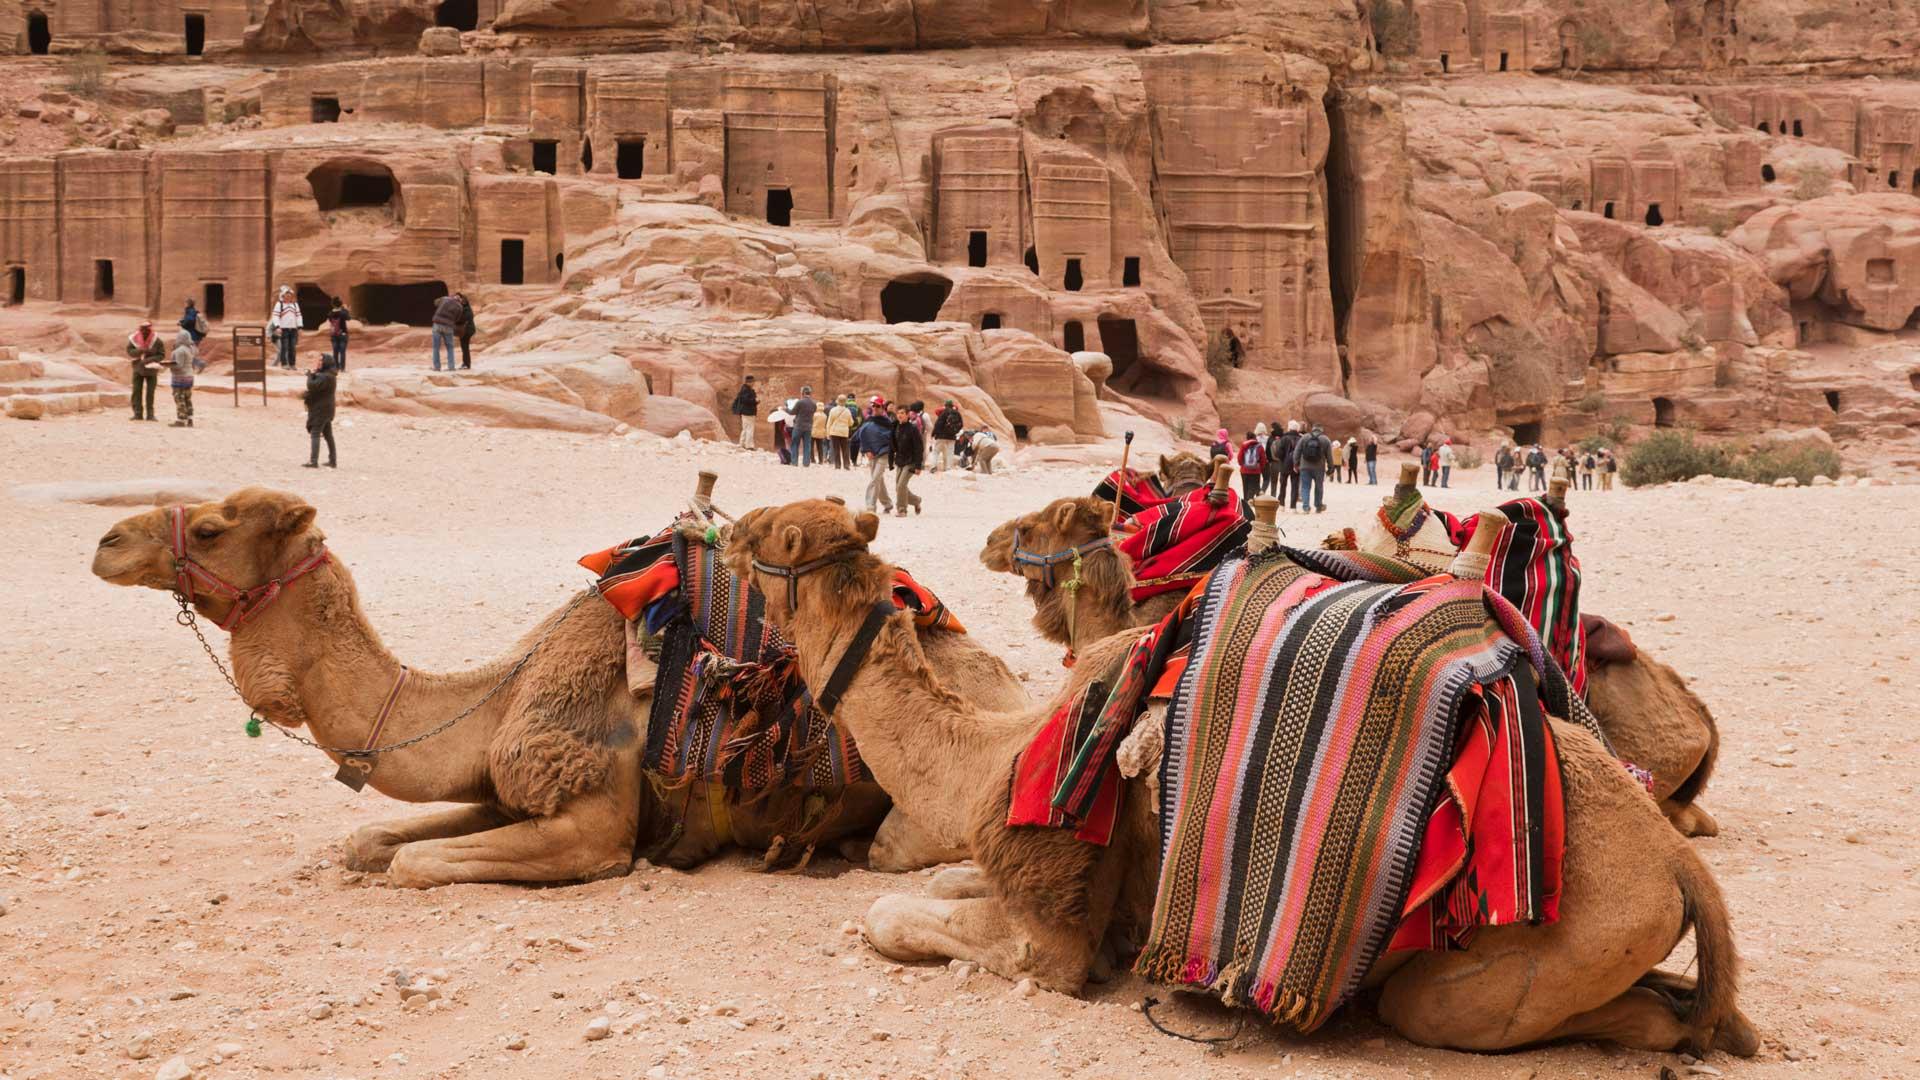 Camels at the Ancient Nabatean City of Petra, Jordan